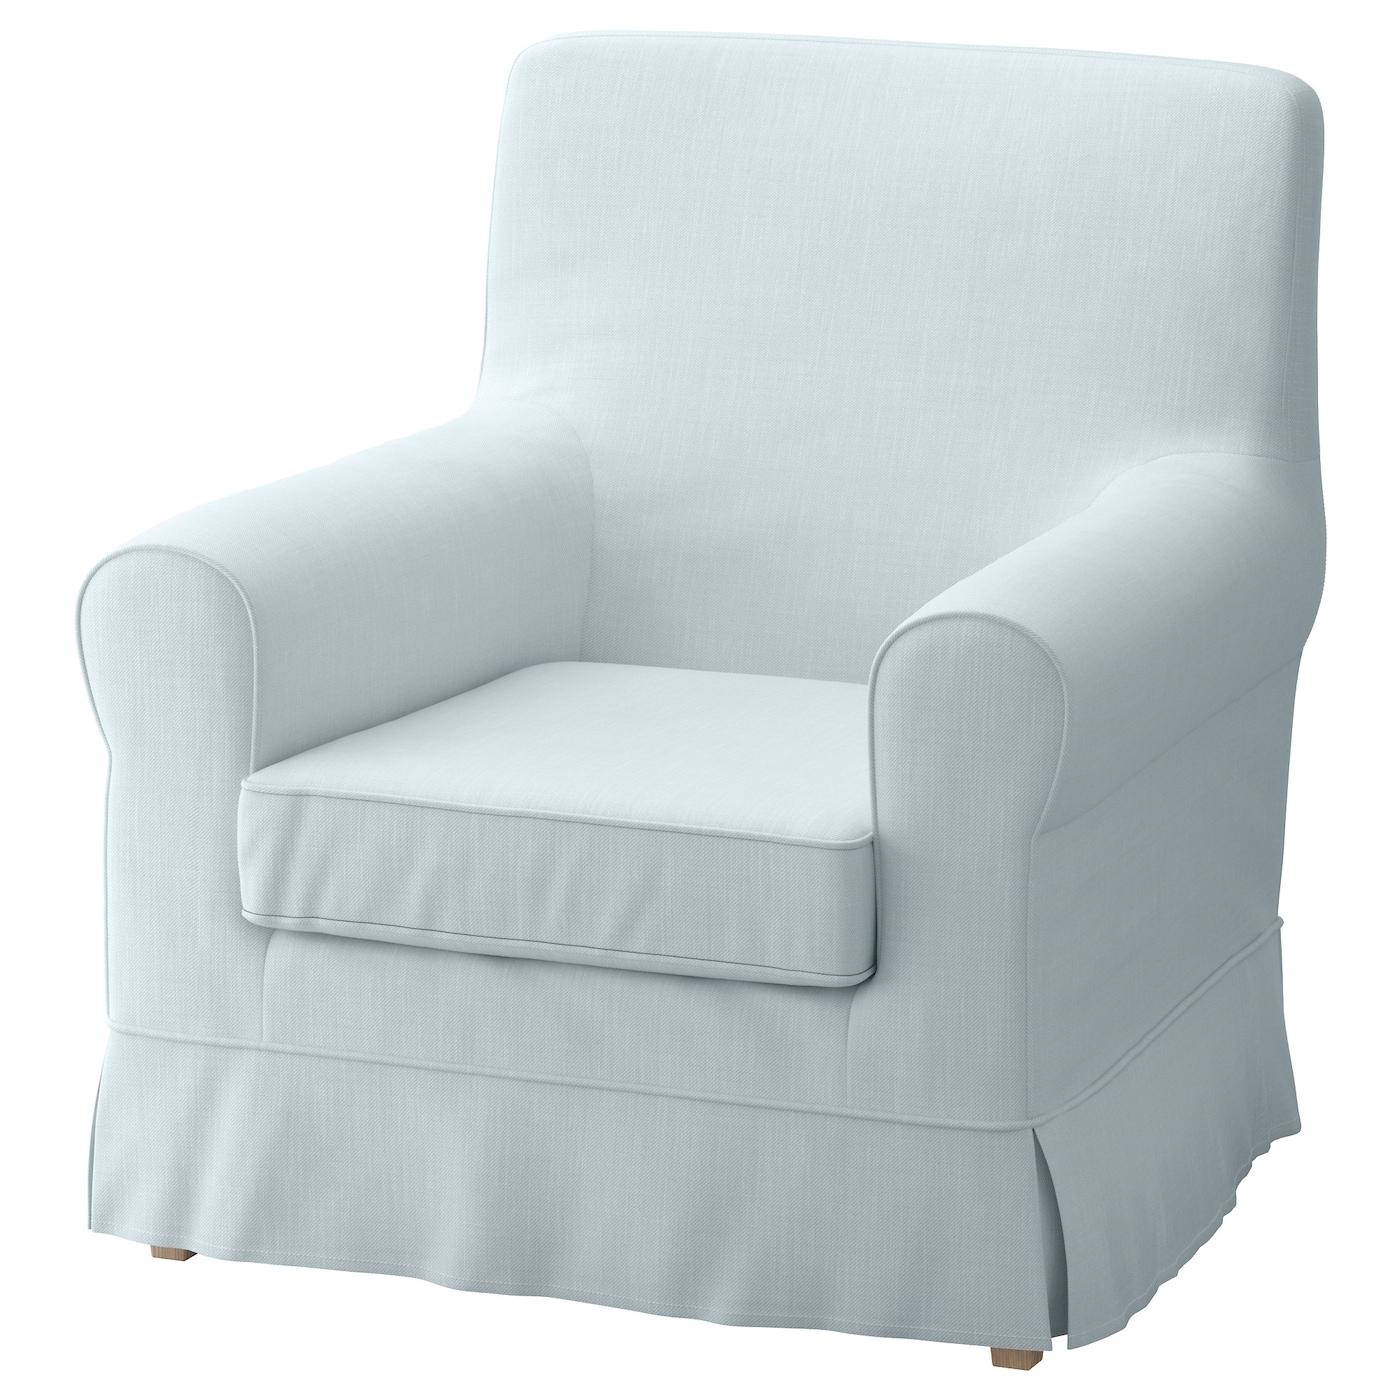 Jennylund housse de fauteuil nordvalla bleu clair ikea for Housse fauteuil ikea